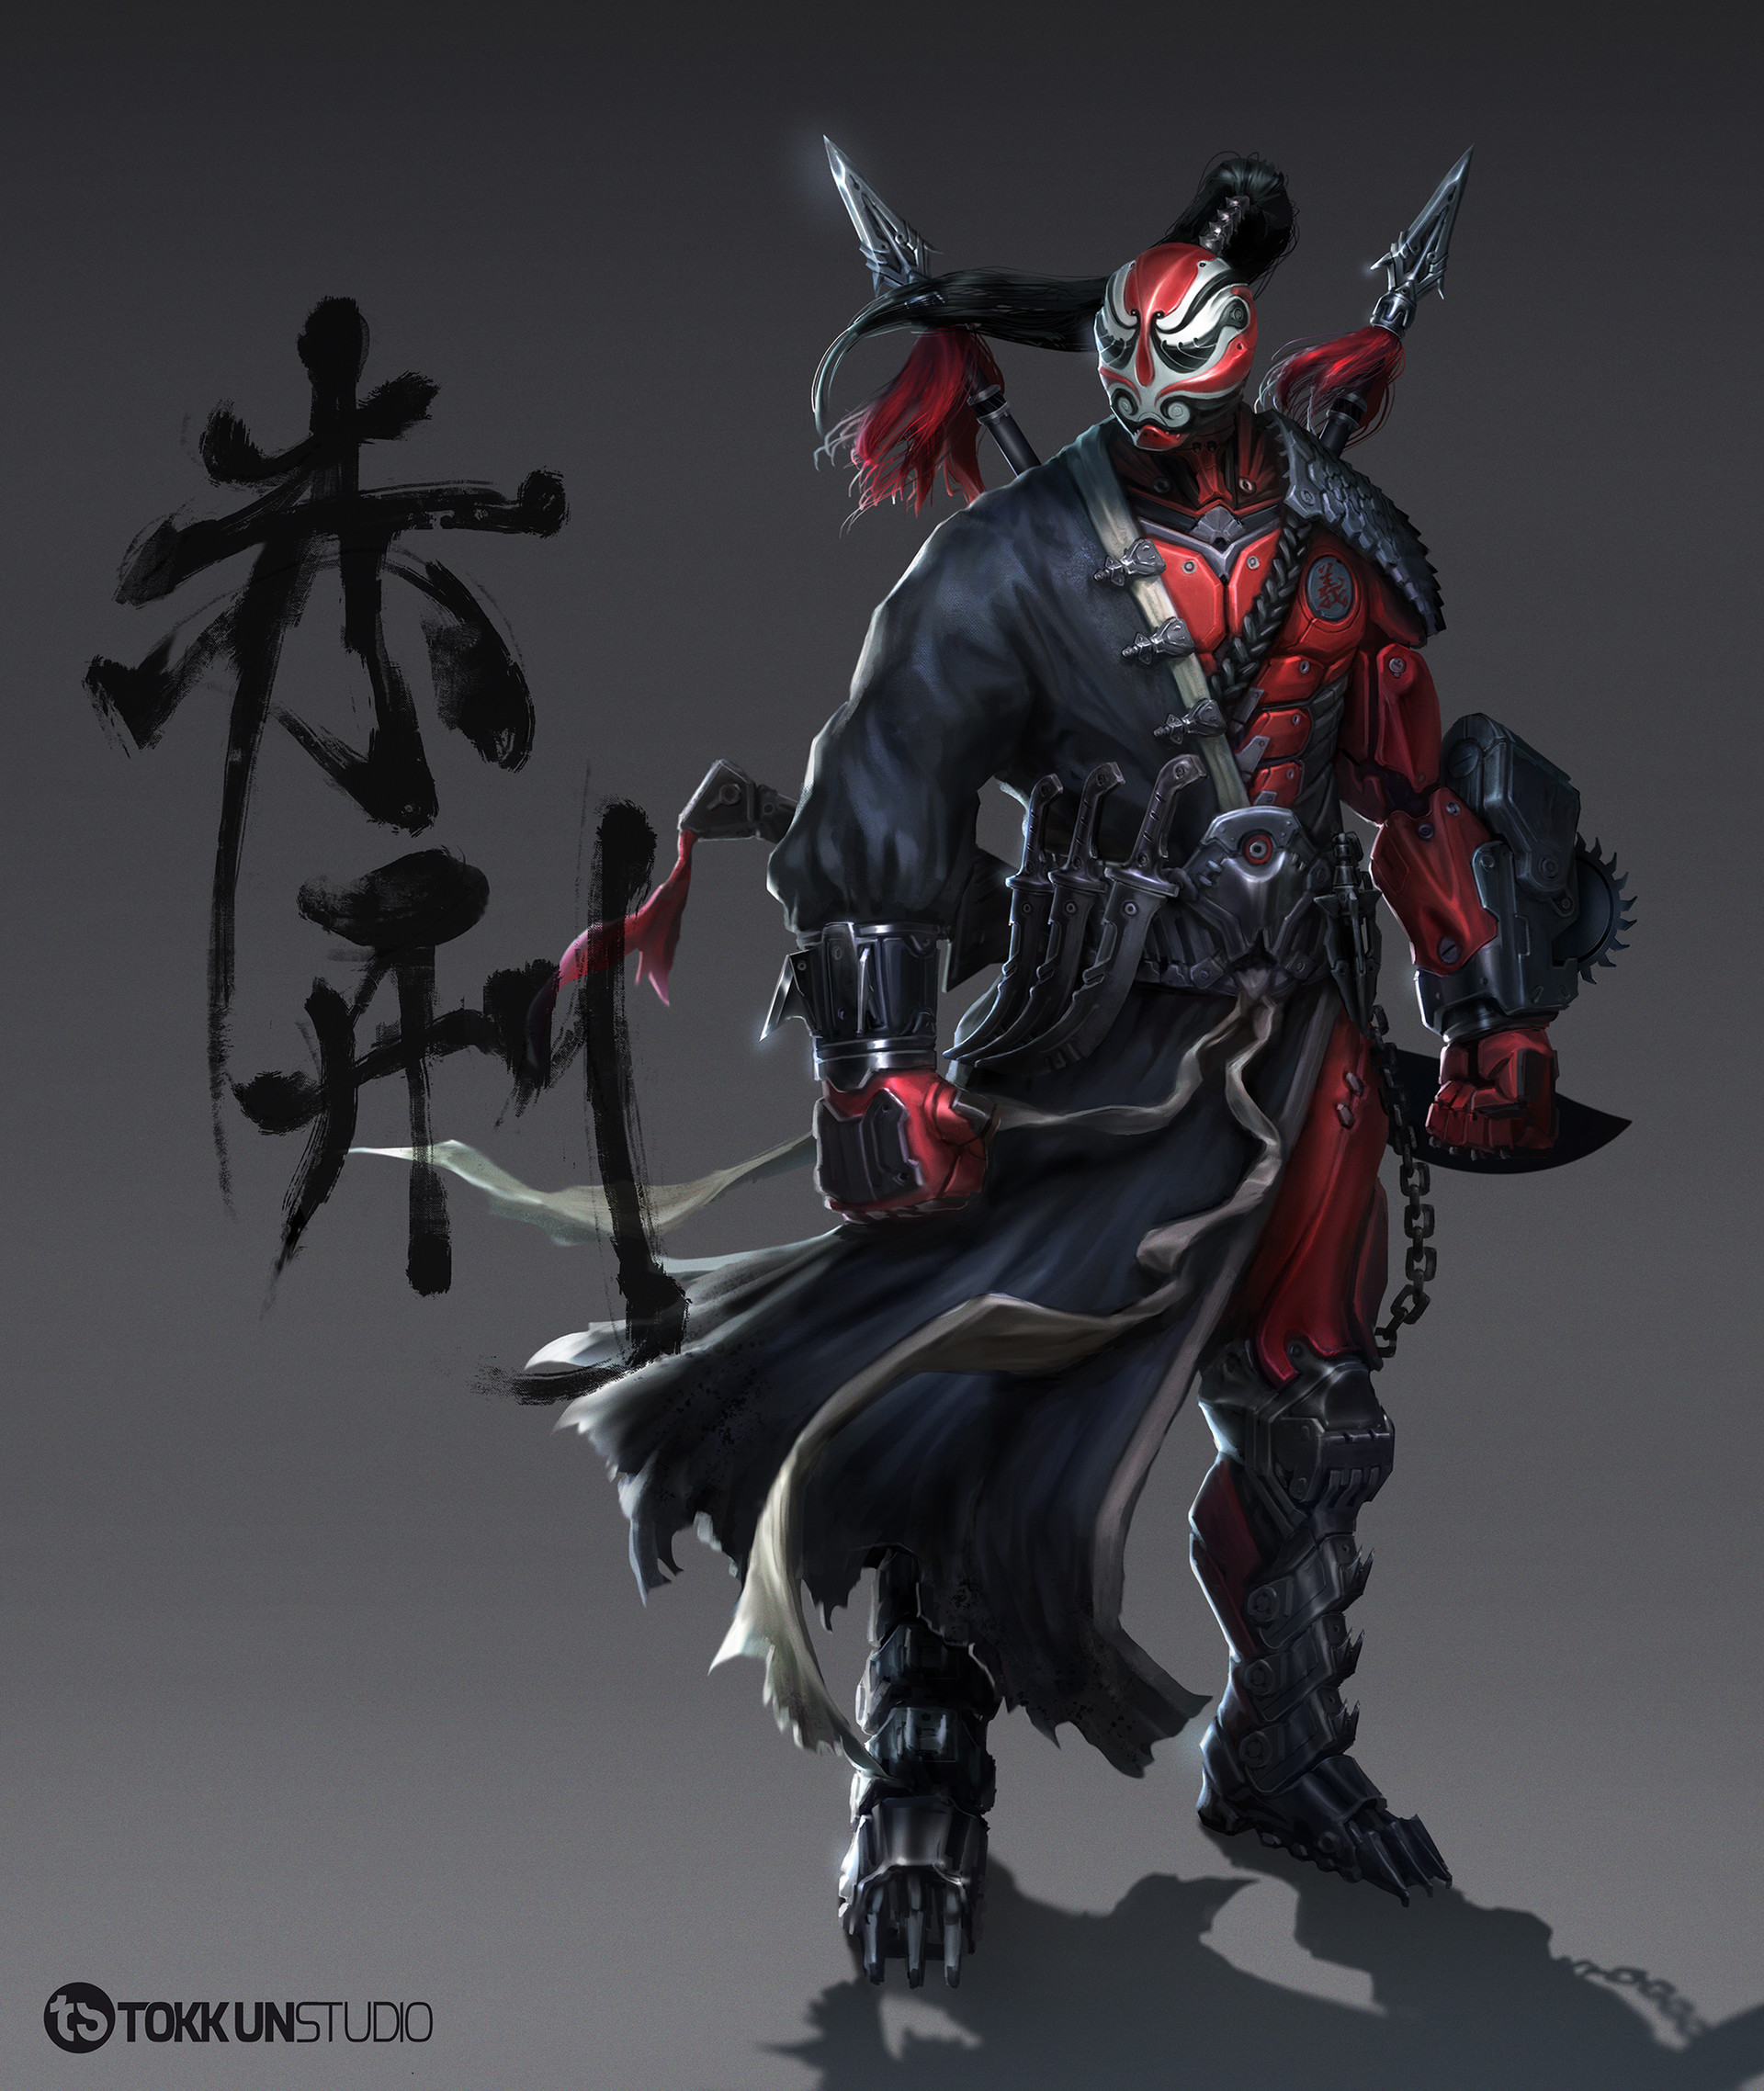 Tokkun studio character 4